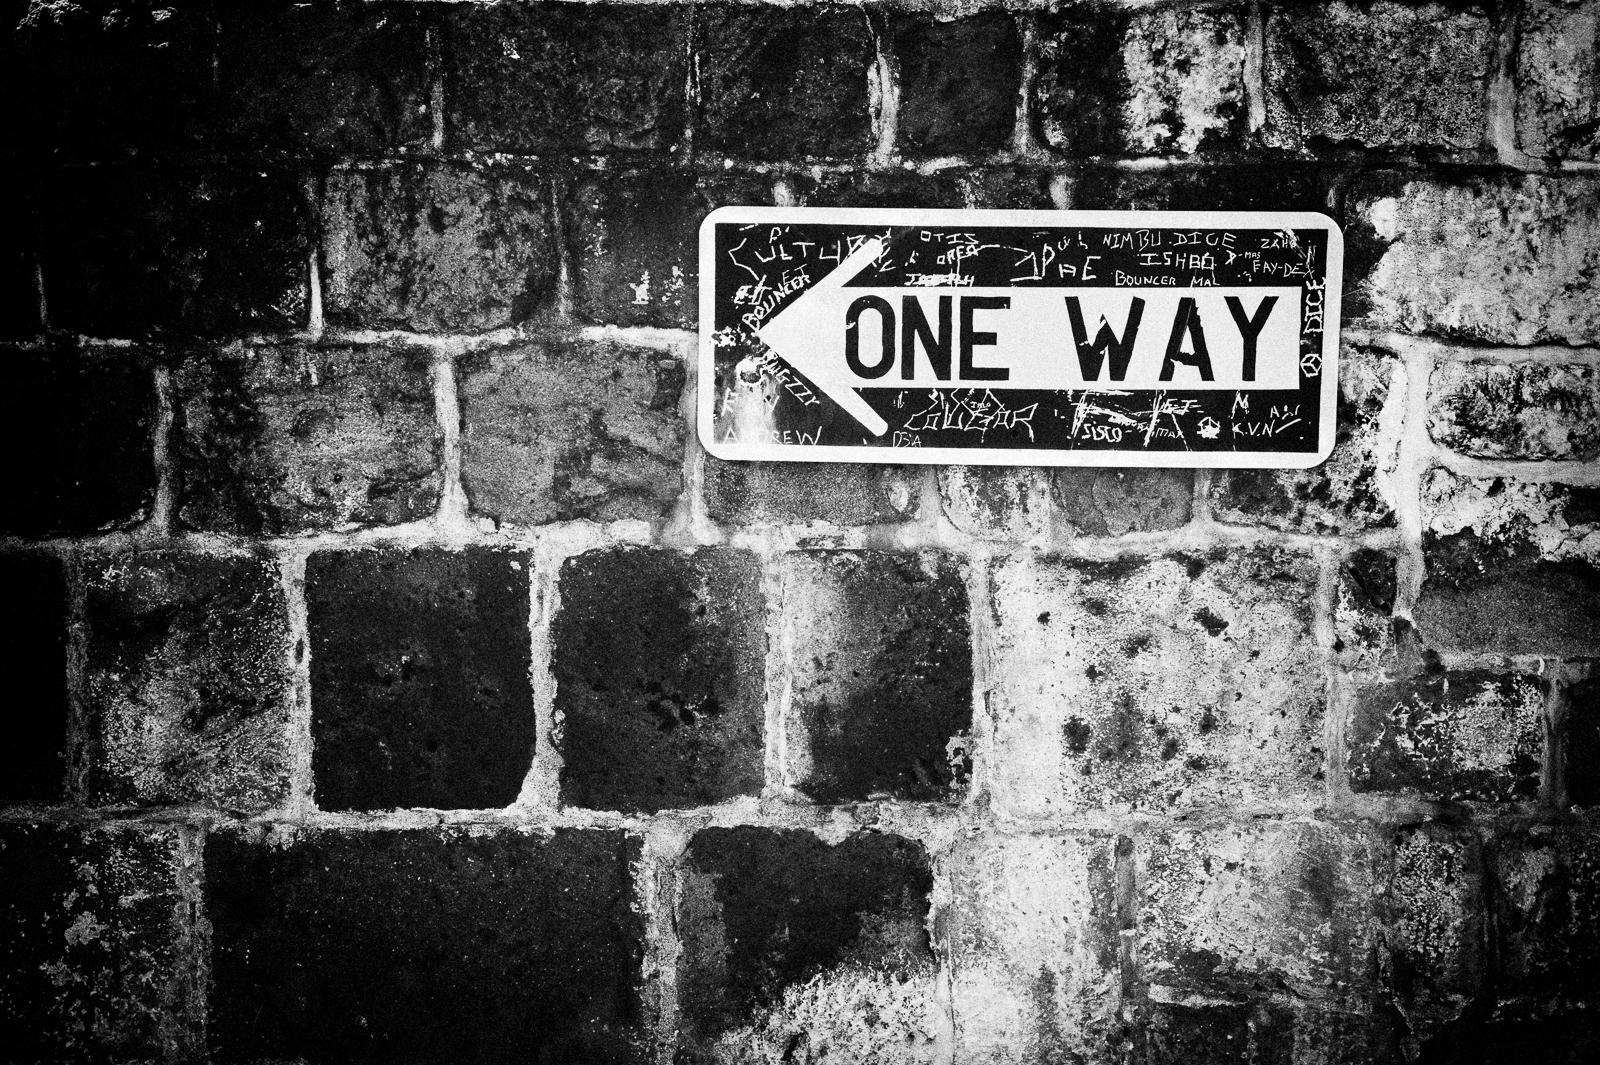 Howard Ignatius. One Way To Nowhere. CC 2.0 by-nc-sa https://flic.kr/p/iQVacm